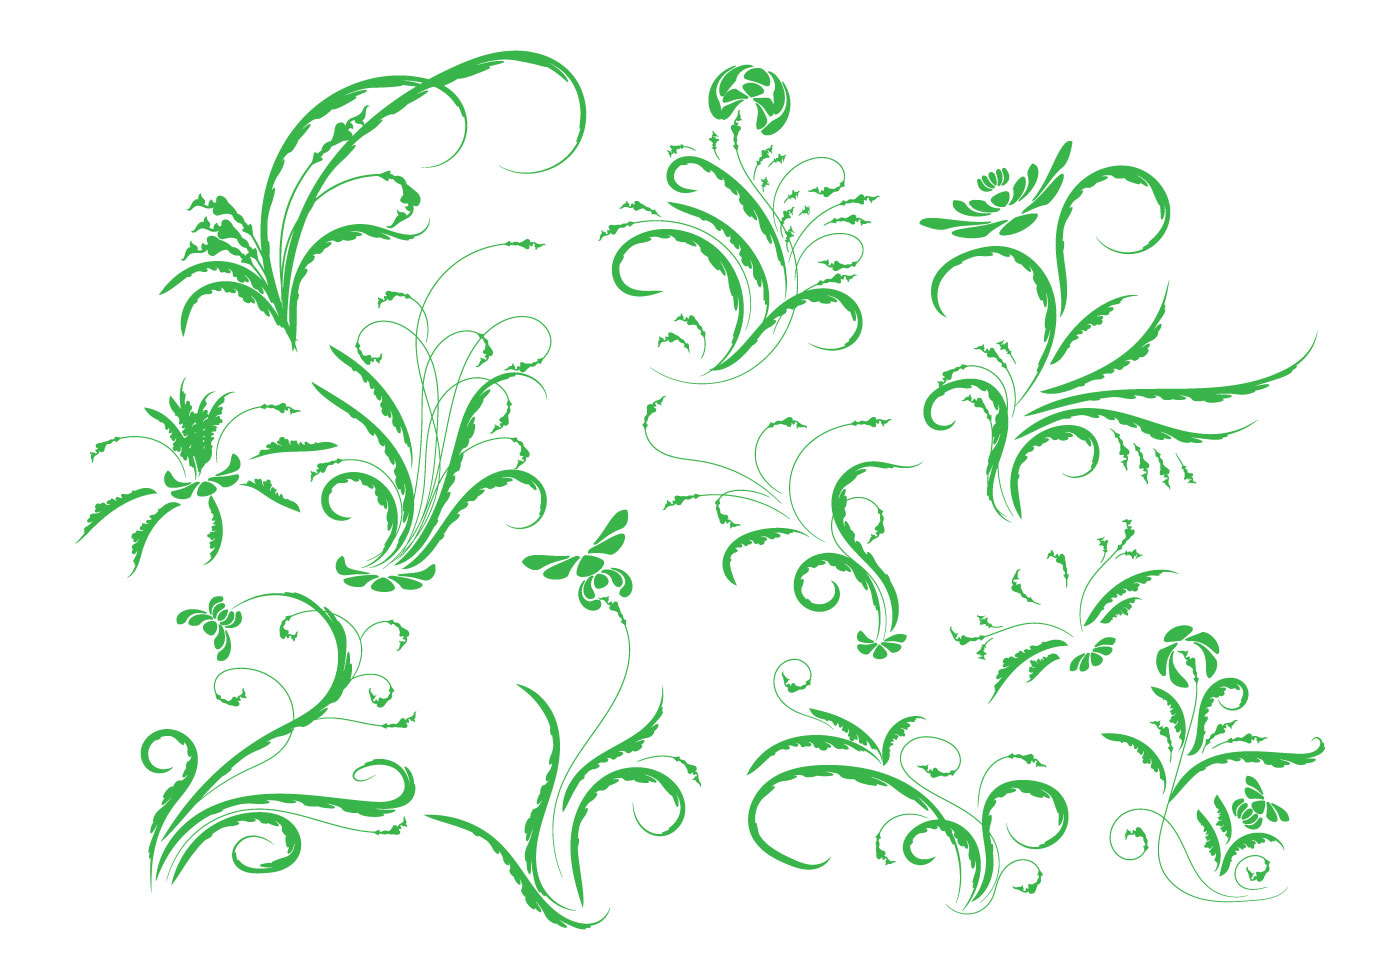 Floral Ornament Vector Free: Vintage Floral Ornament Vector